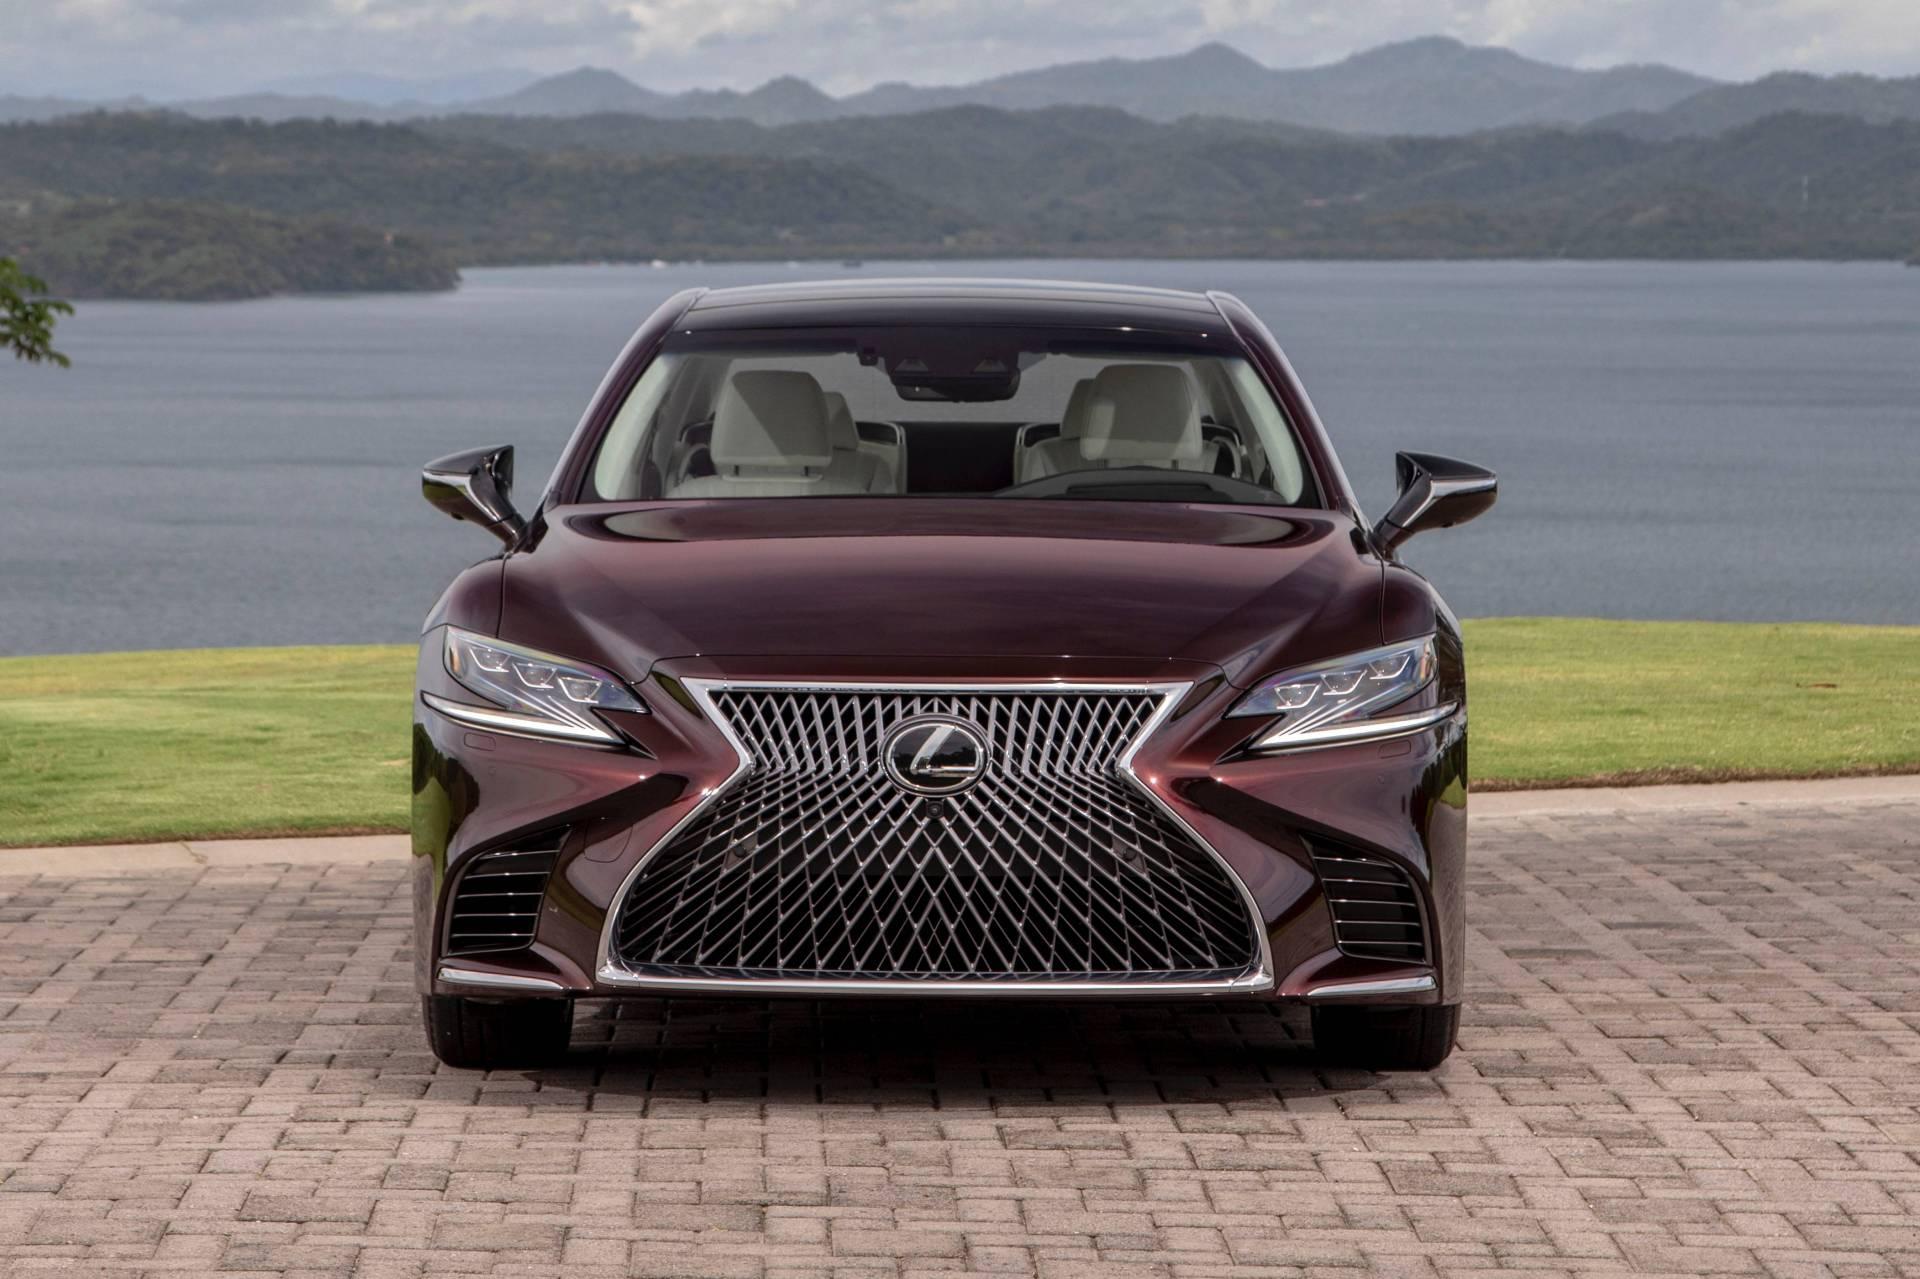 2020-lexus-ls-500-inspiration-series-1.jpg